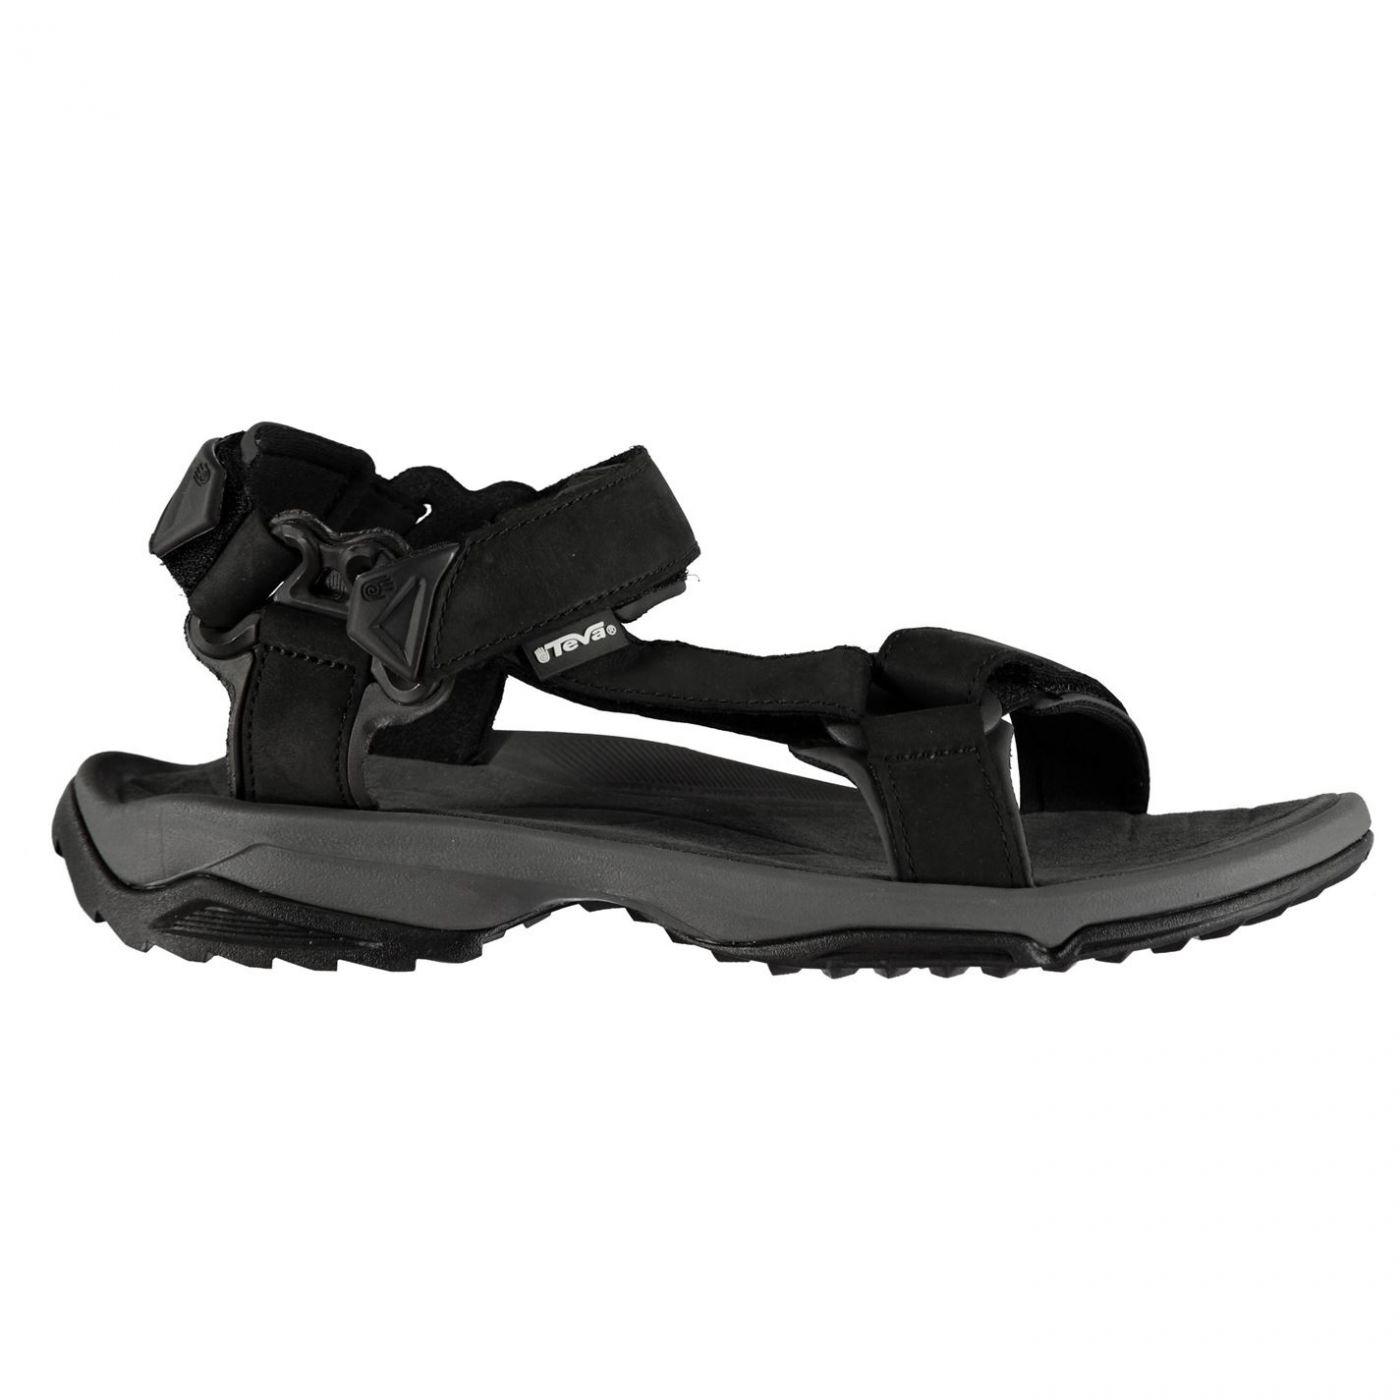 Teva Terra Fi Lite Sandals Mens